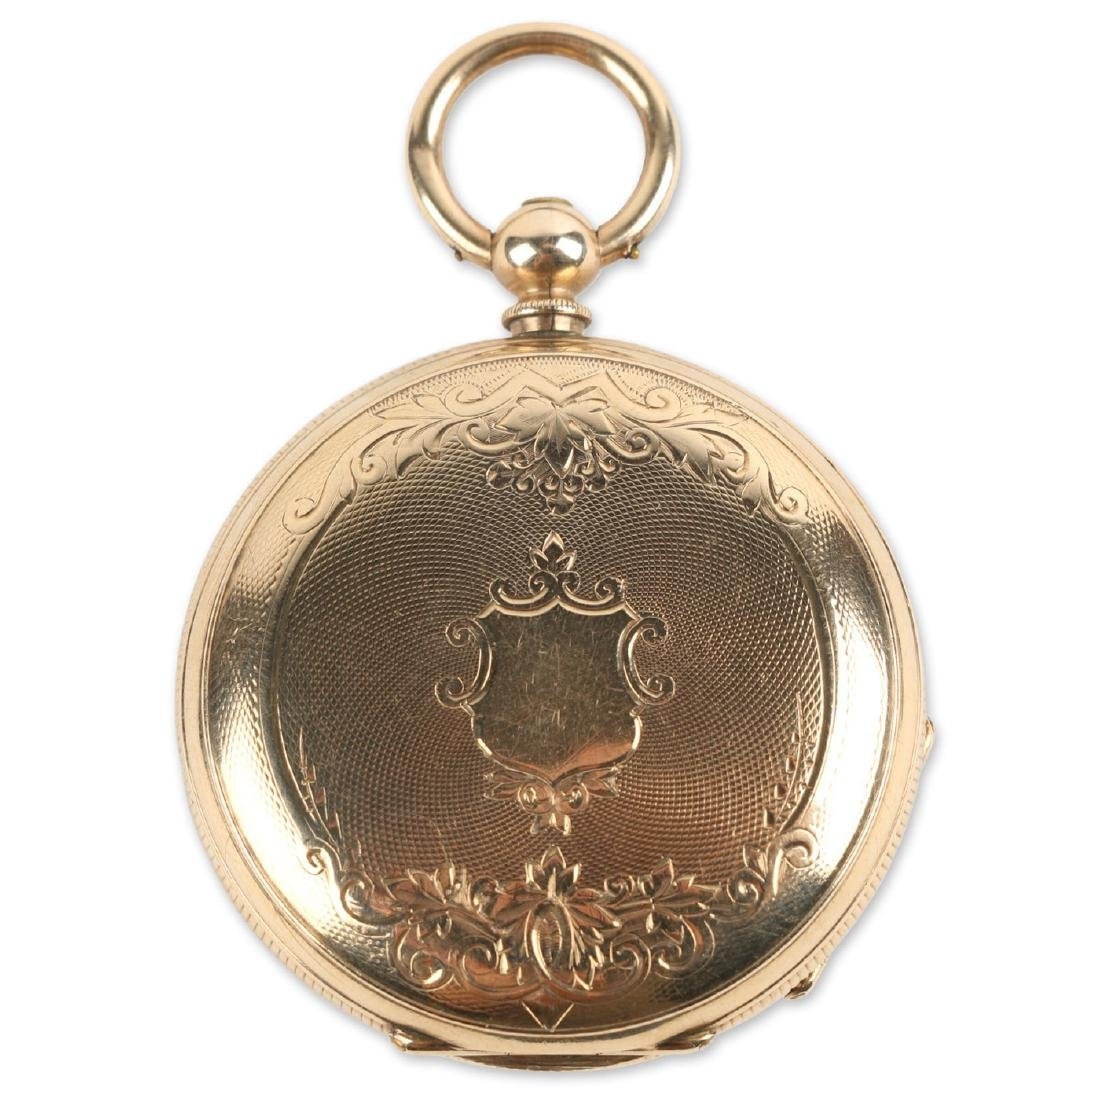 Solid 14K Gold L. Reymond 23J Swiss Pocket Watch